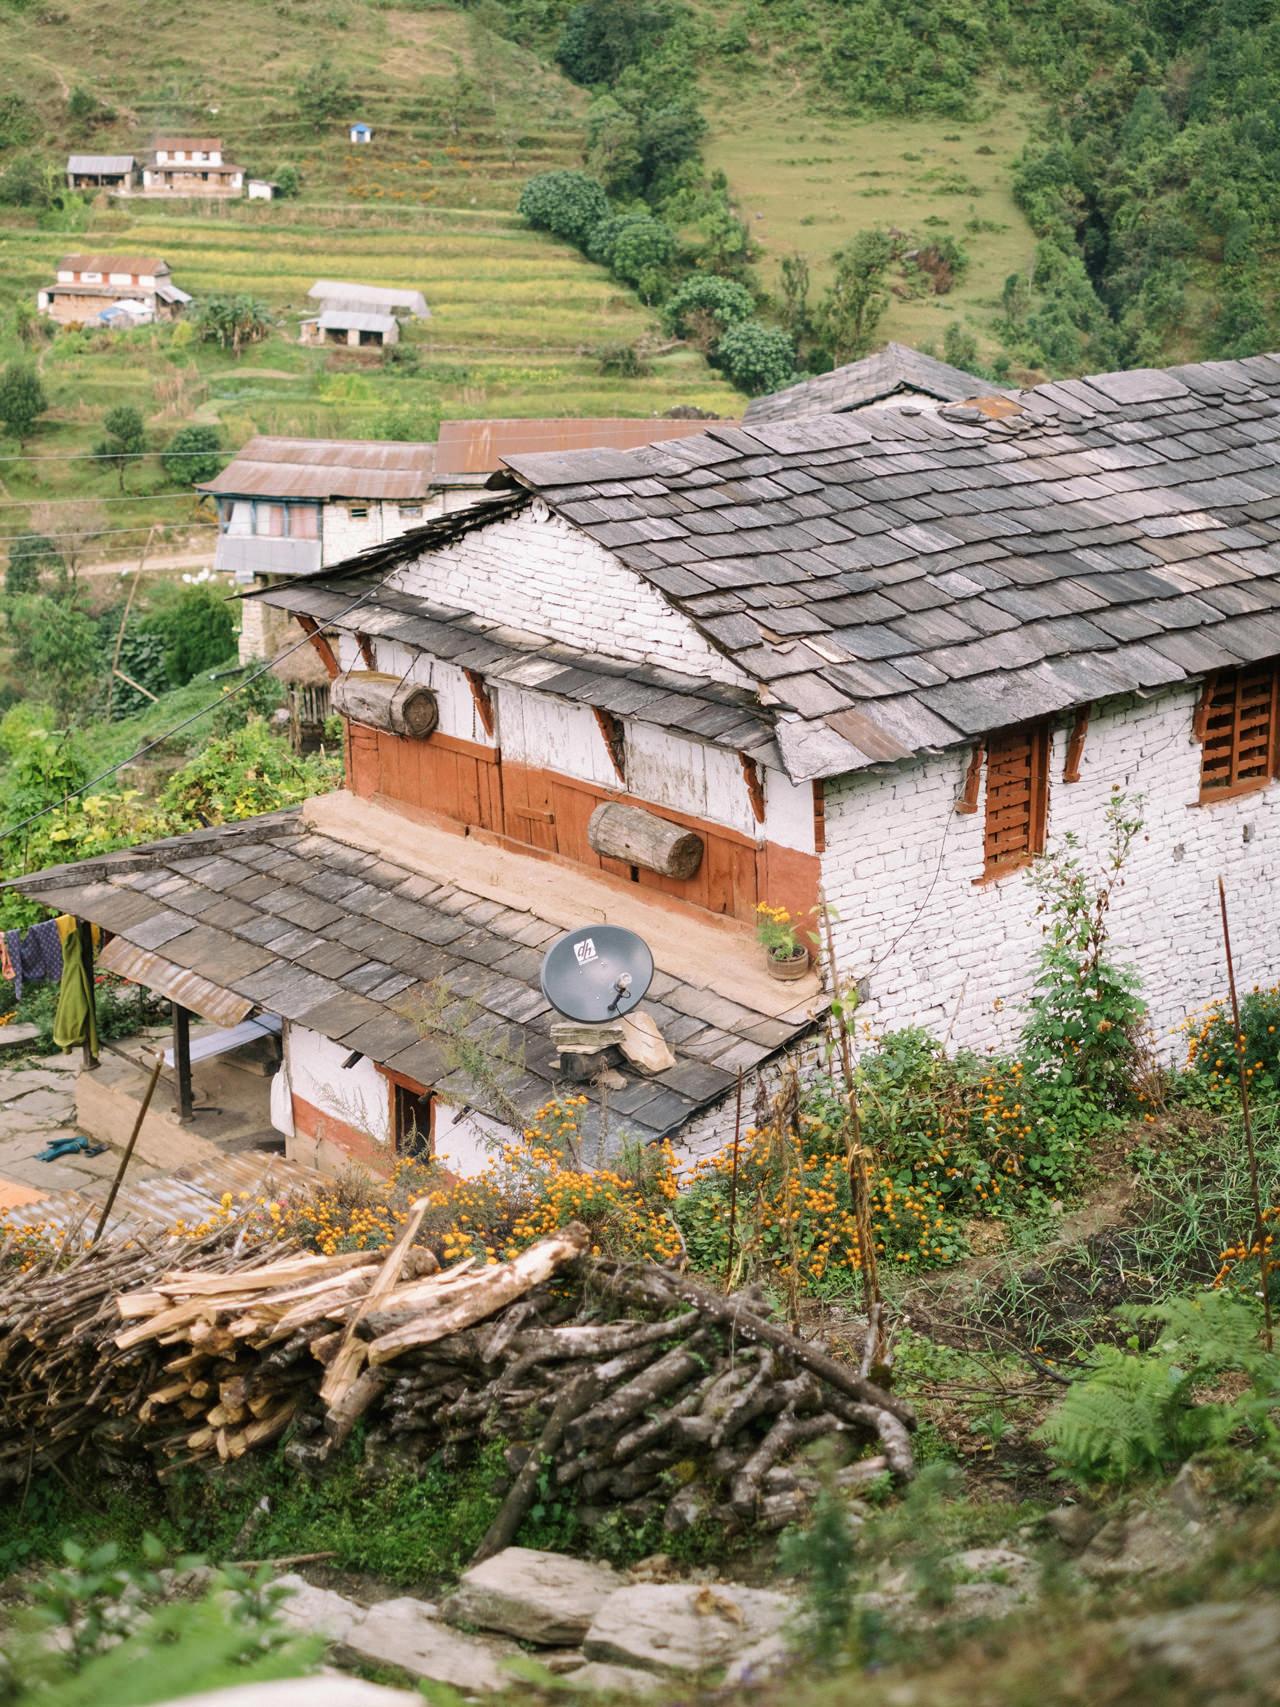 Nepal 2019 - Trekking Annapurna Base Camp 58